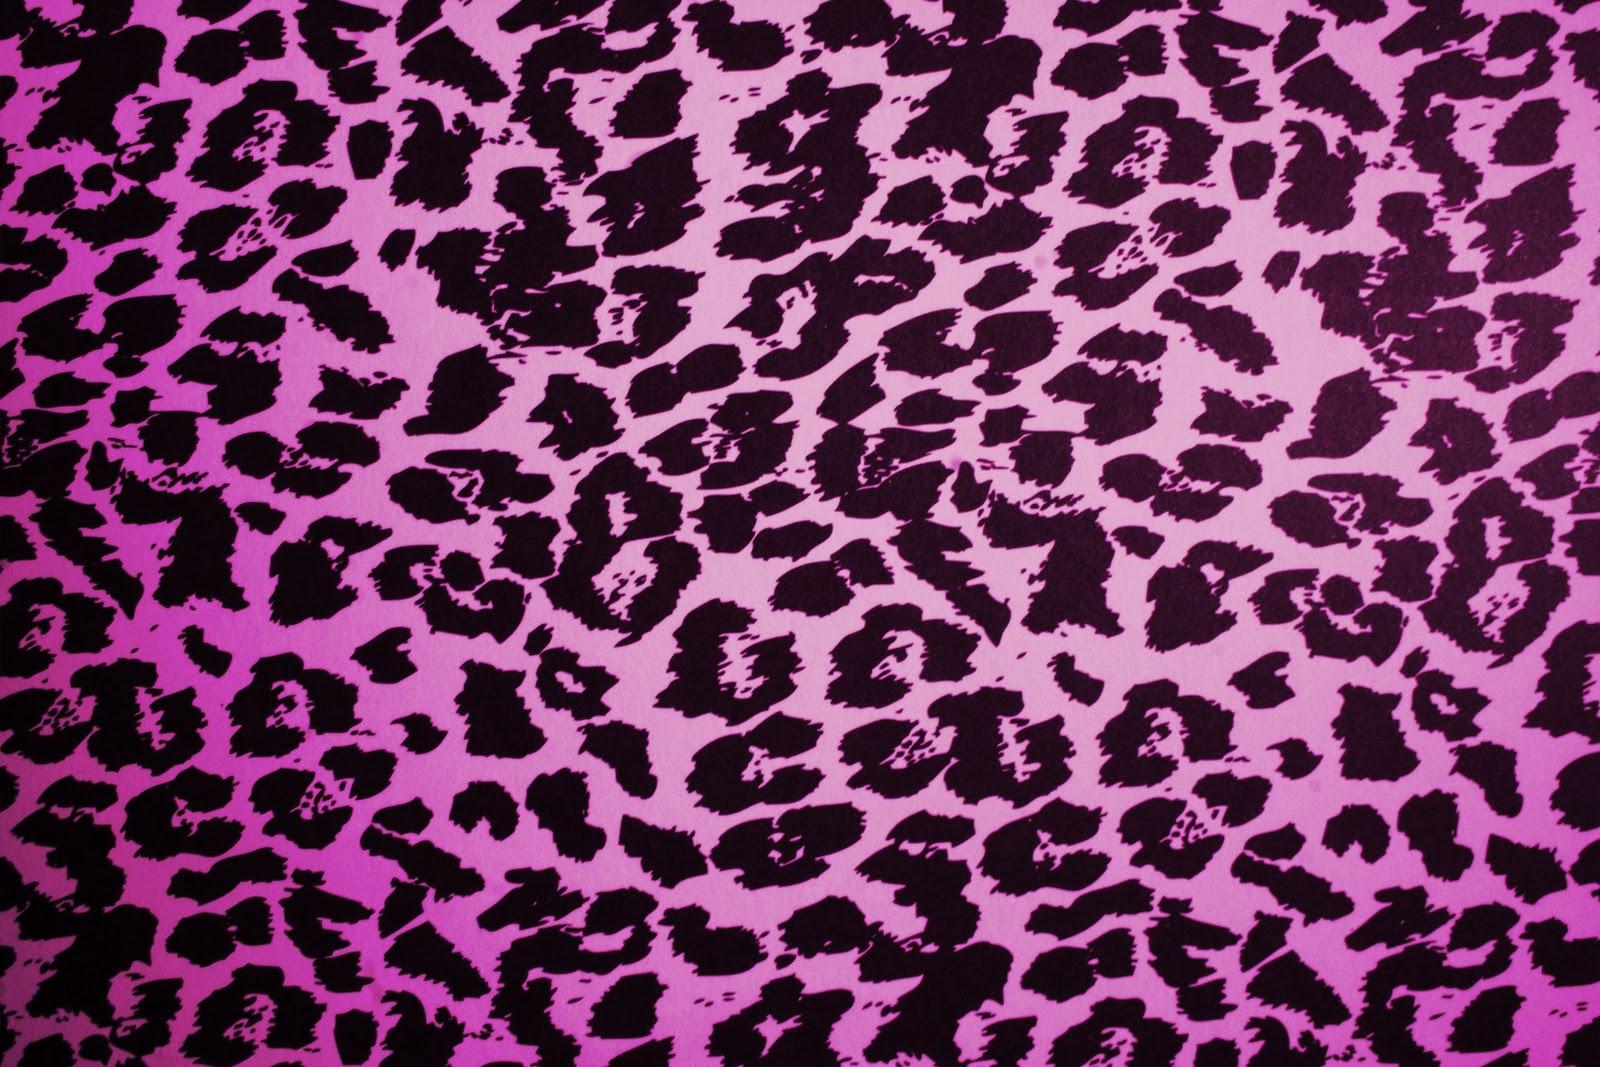 Animal Print. Zedge Live Wallpapers